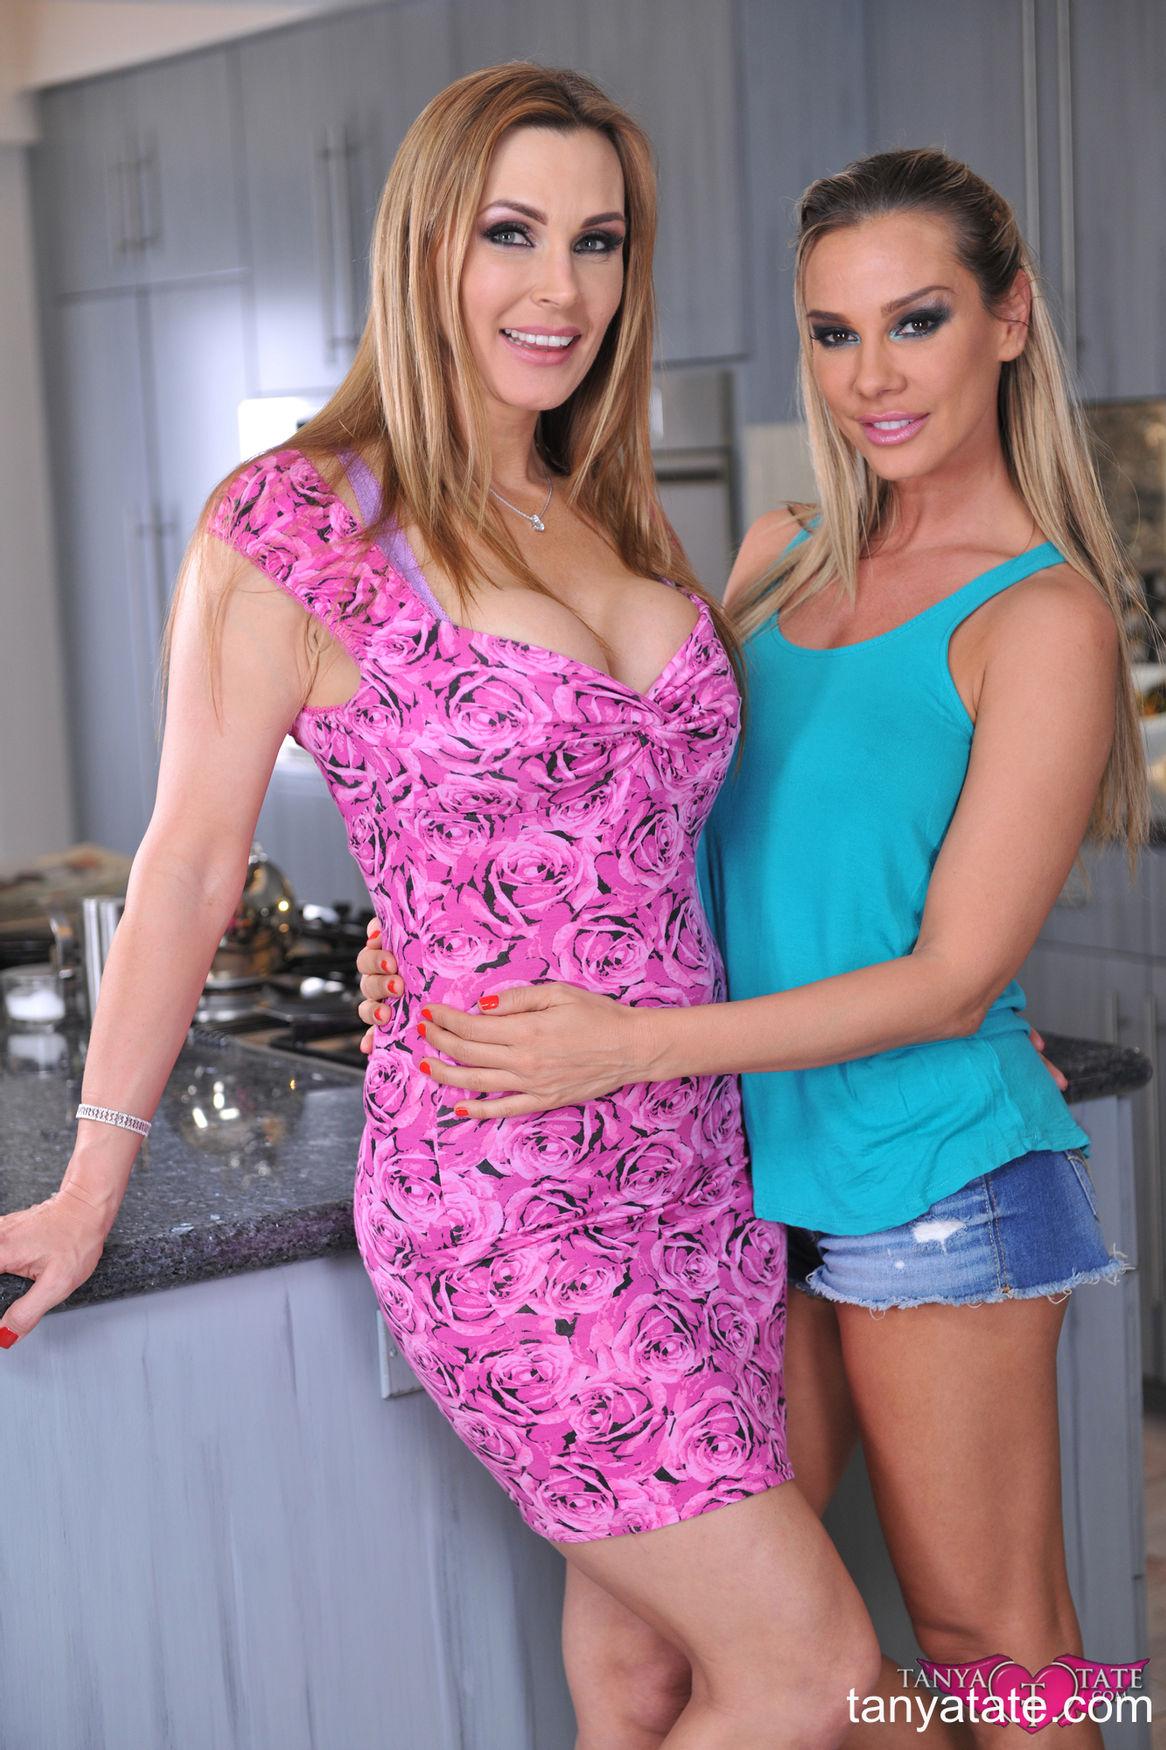 Amateur lesbian milf Sandra and her mature pornstar girlfriend Tanya Tate non nude flirt from Ta ...